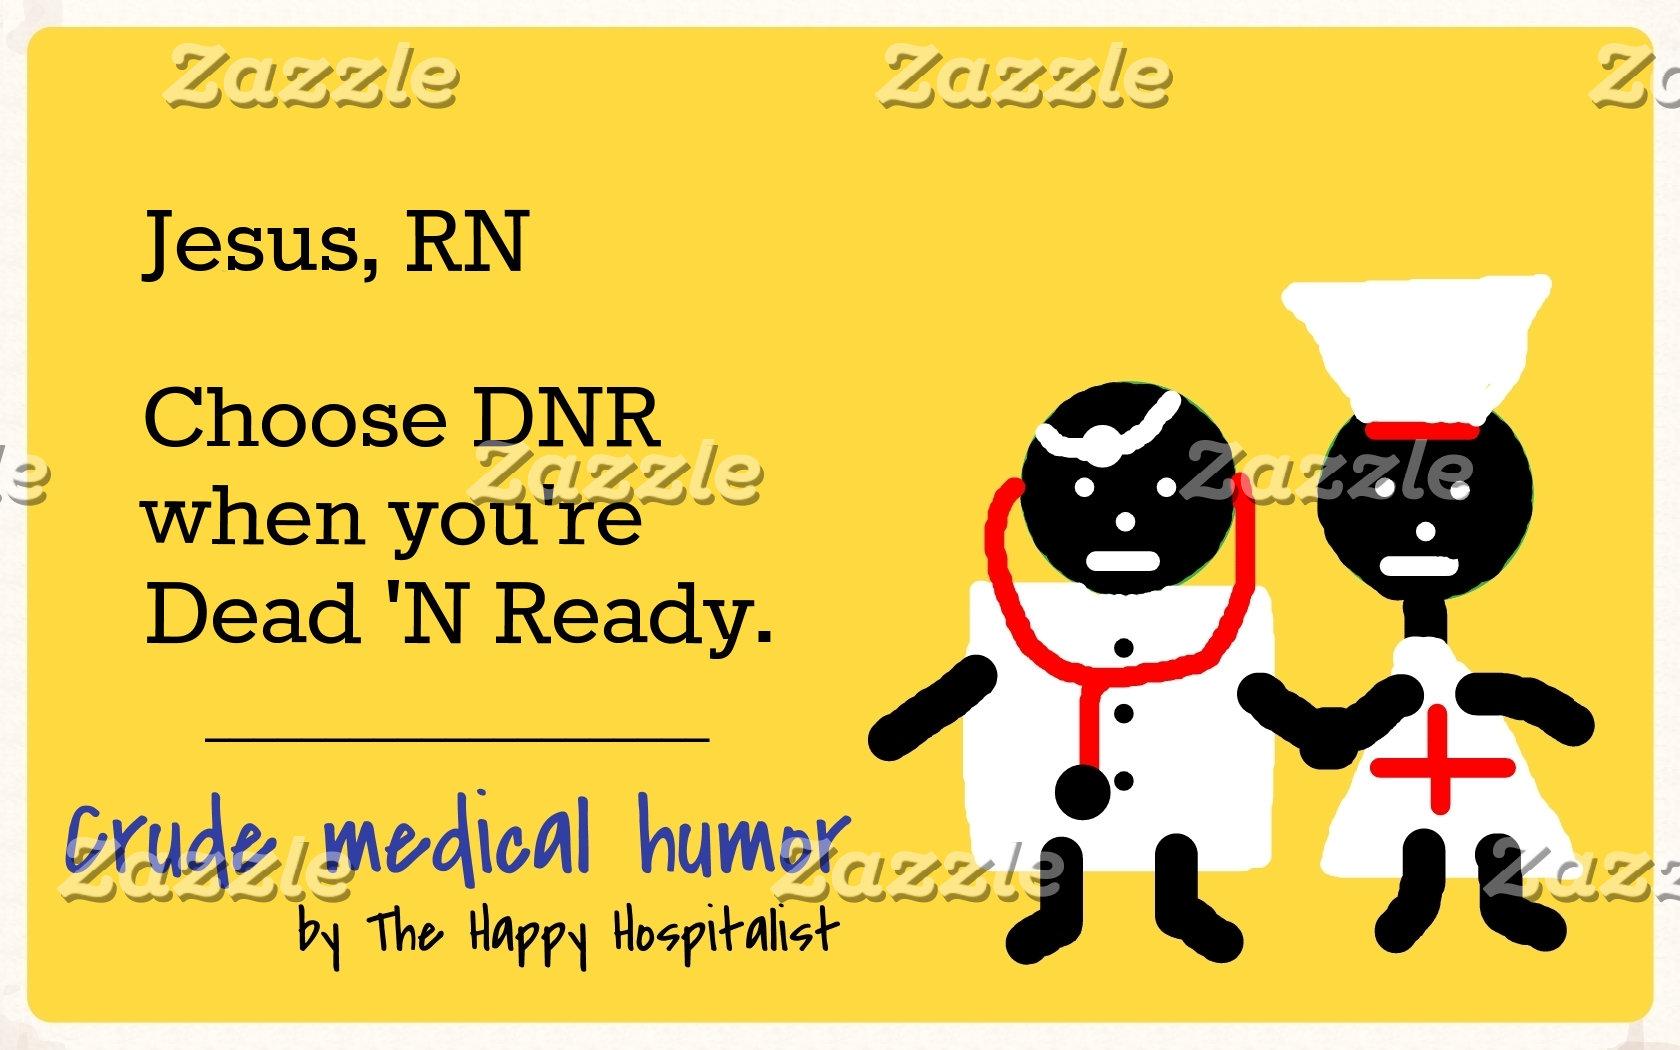 Jesus, RN.  Choose DNR when you're Dead 'N Ready..